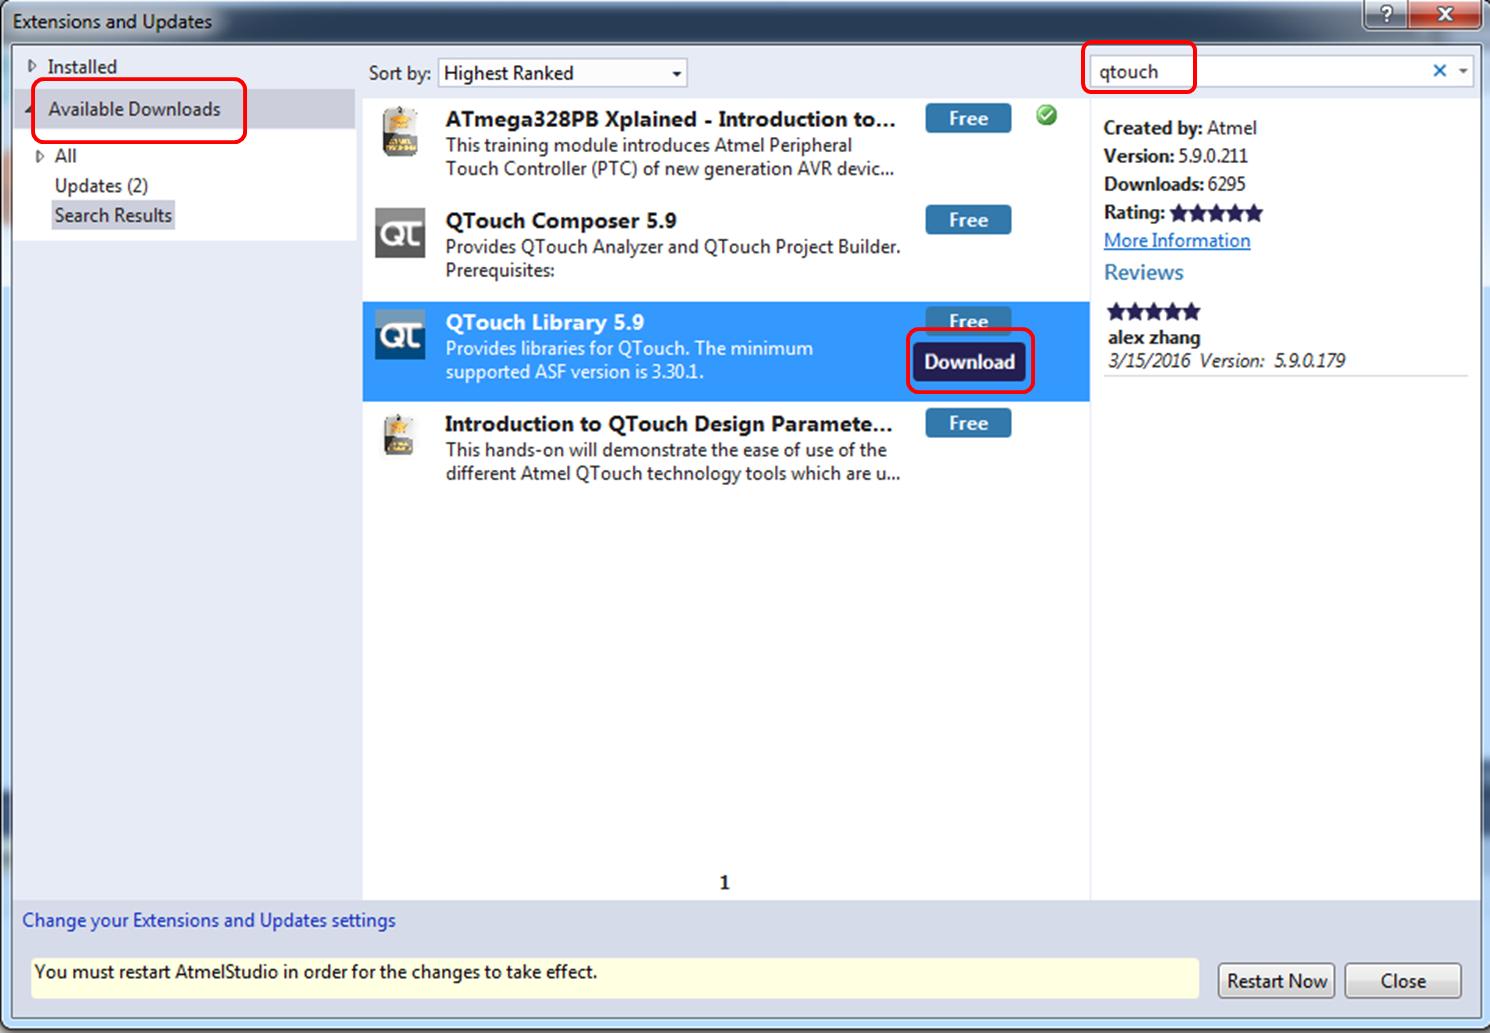 ExtensionsAndUpdatesWindow.png